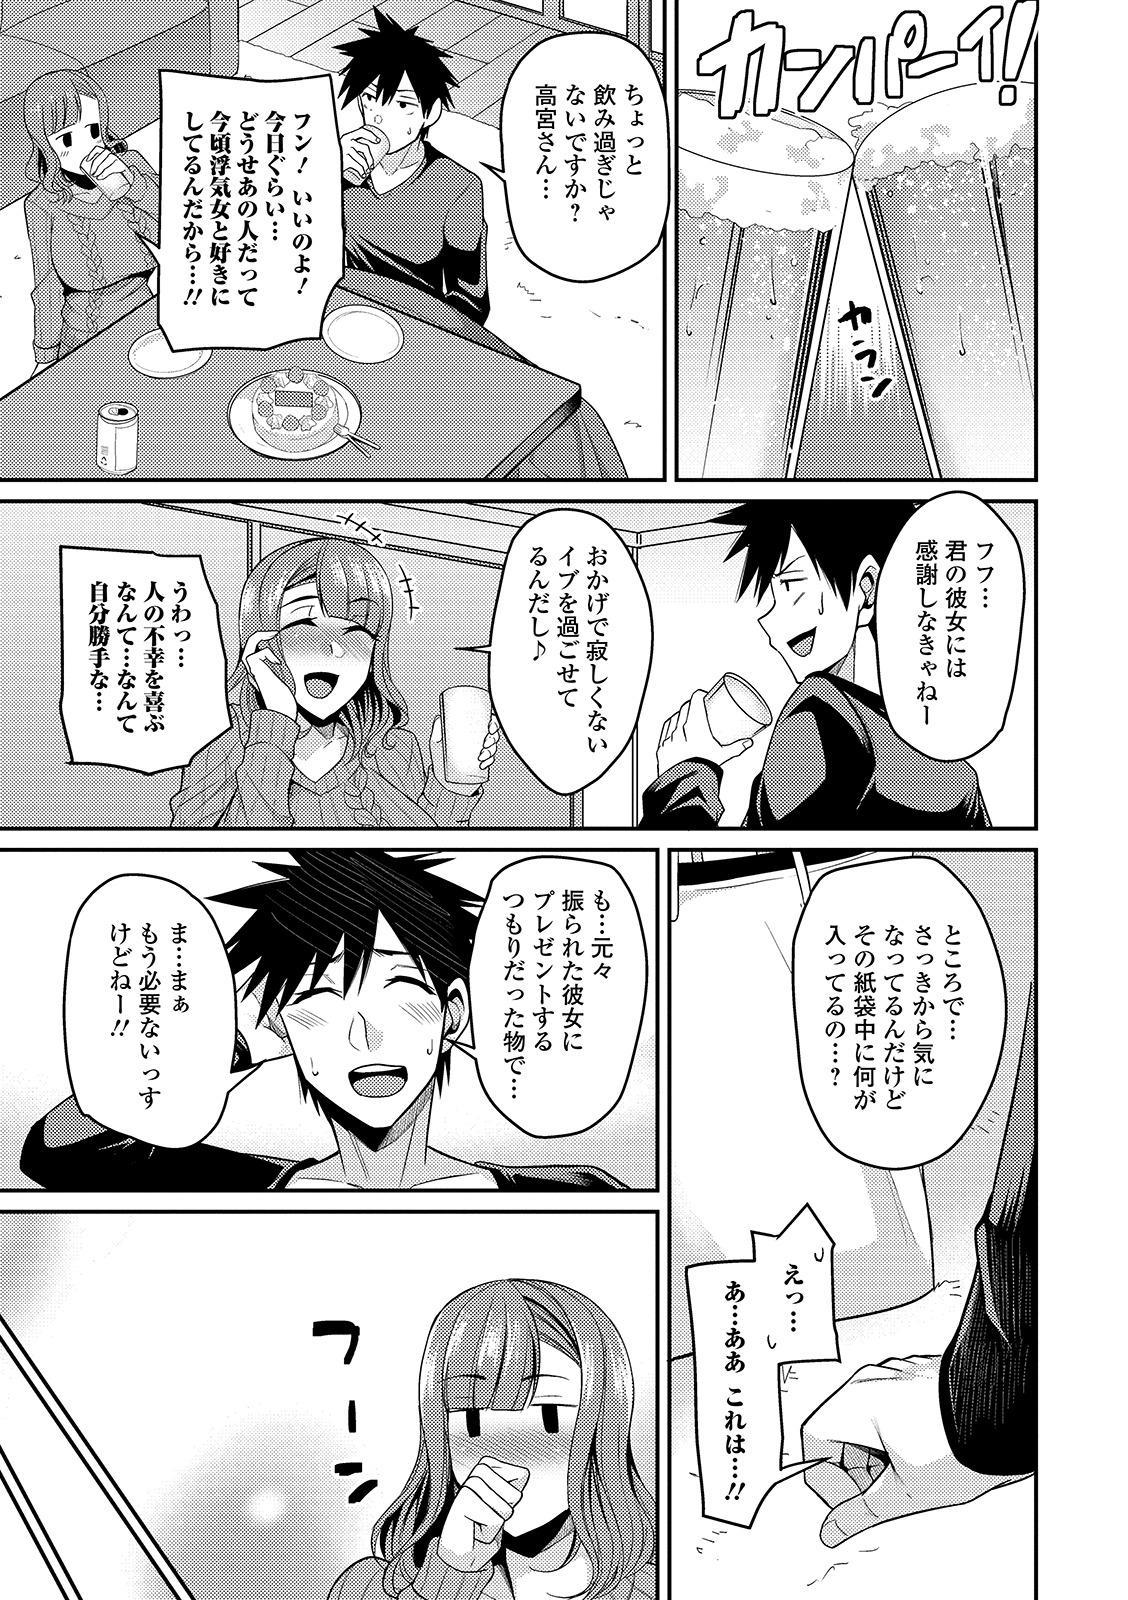 COMIC Shigekiteki SQUIRT!! Vol. 15 56